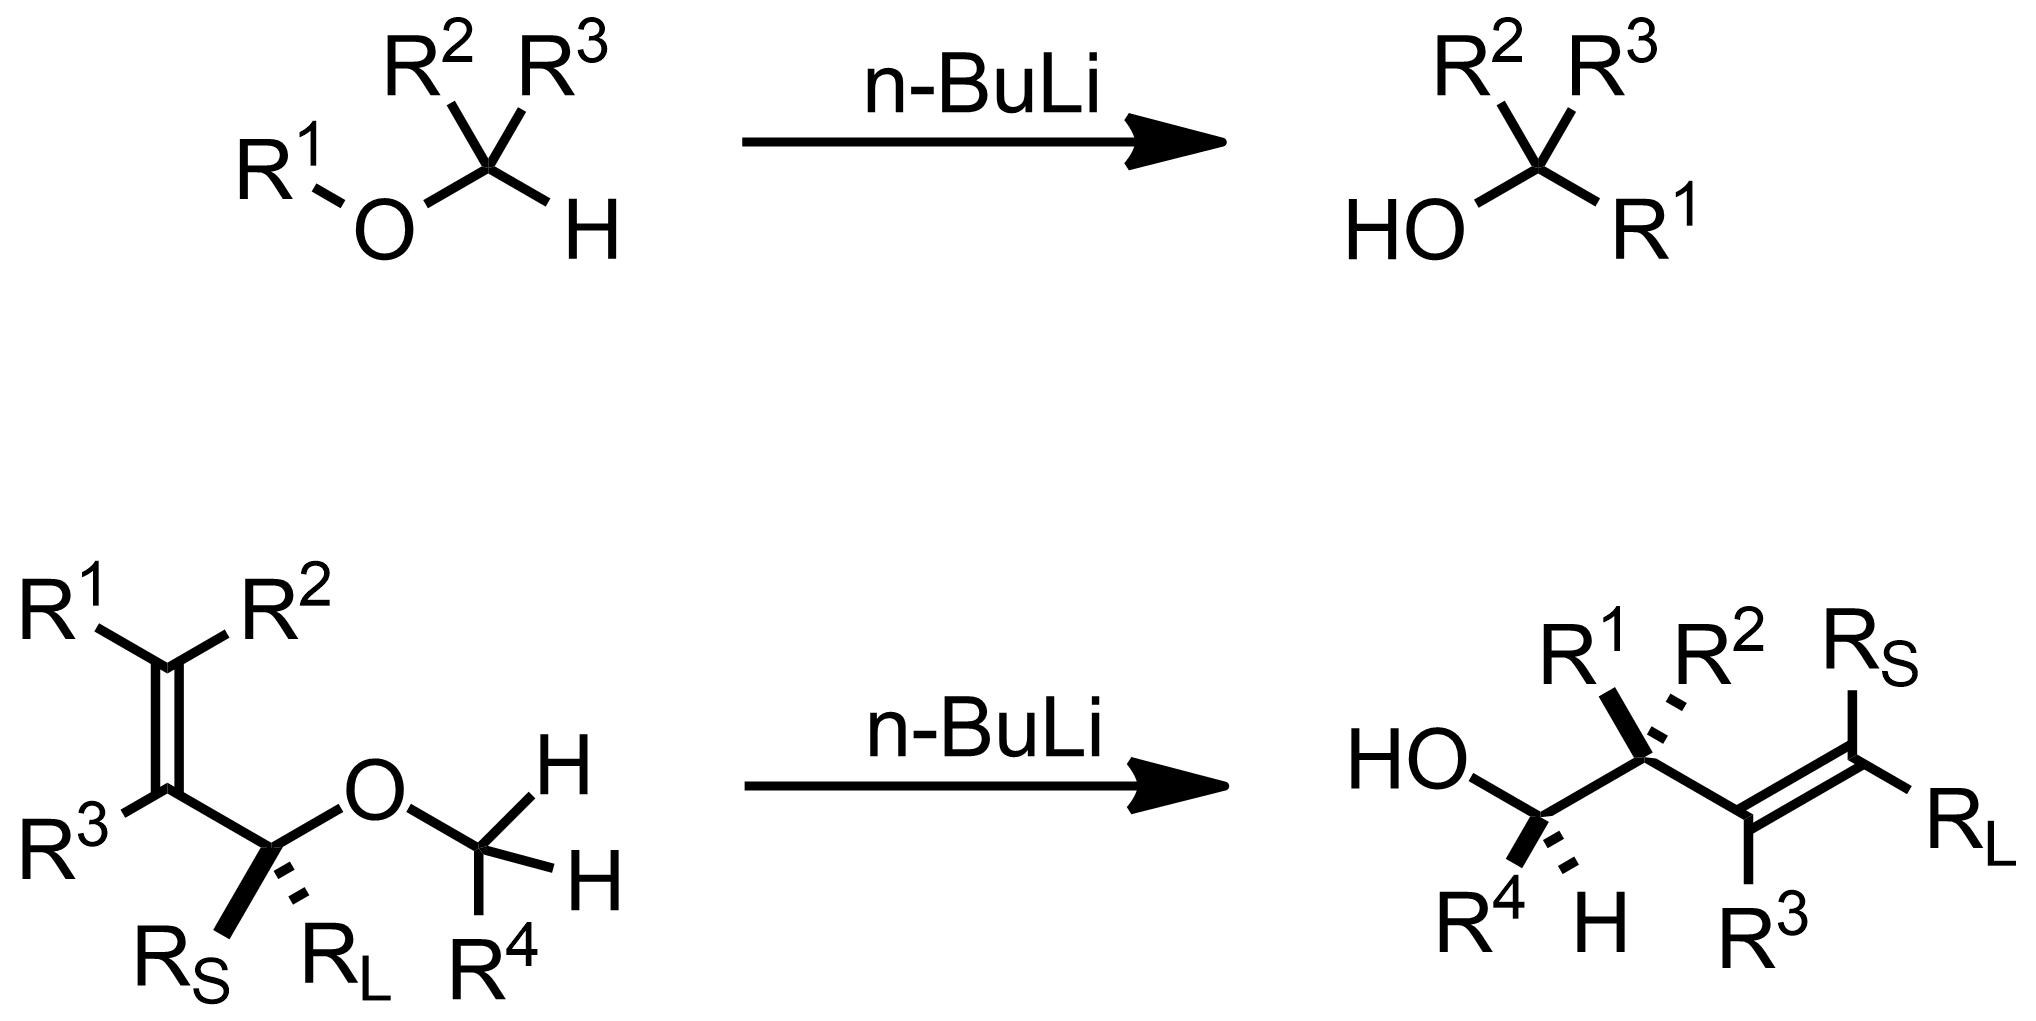 Schematic representation of the Wittig Rearrangement-[2,3].